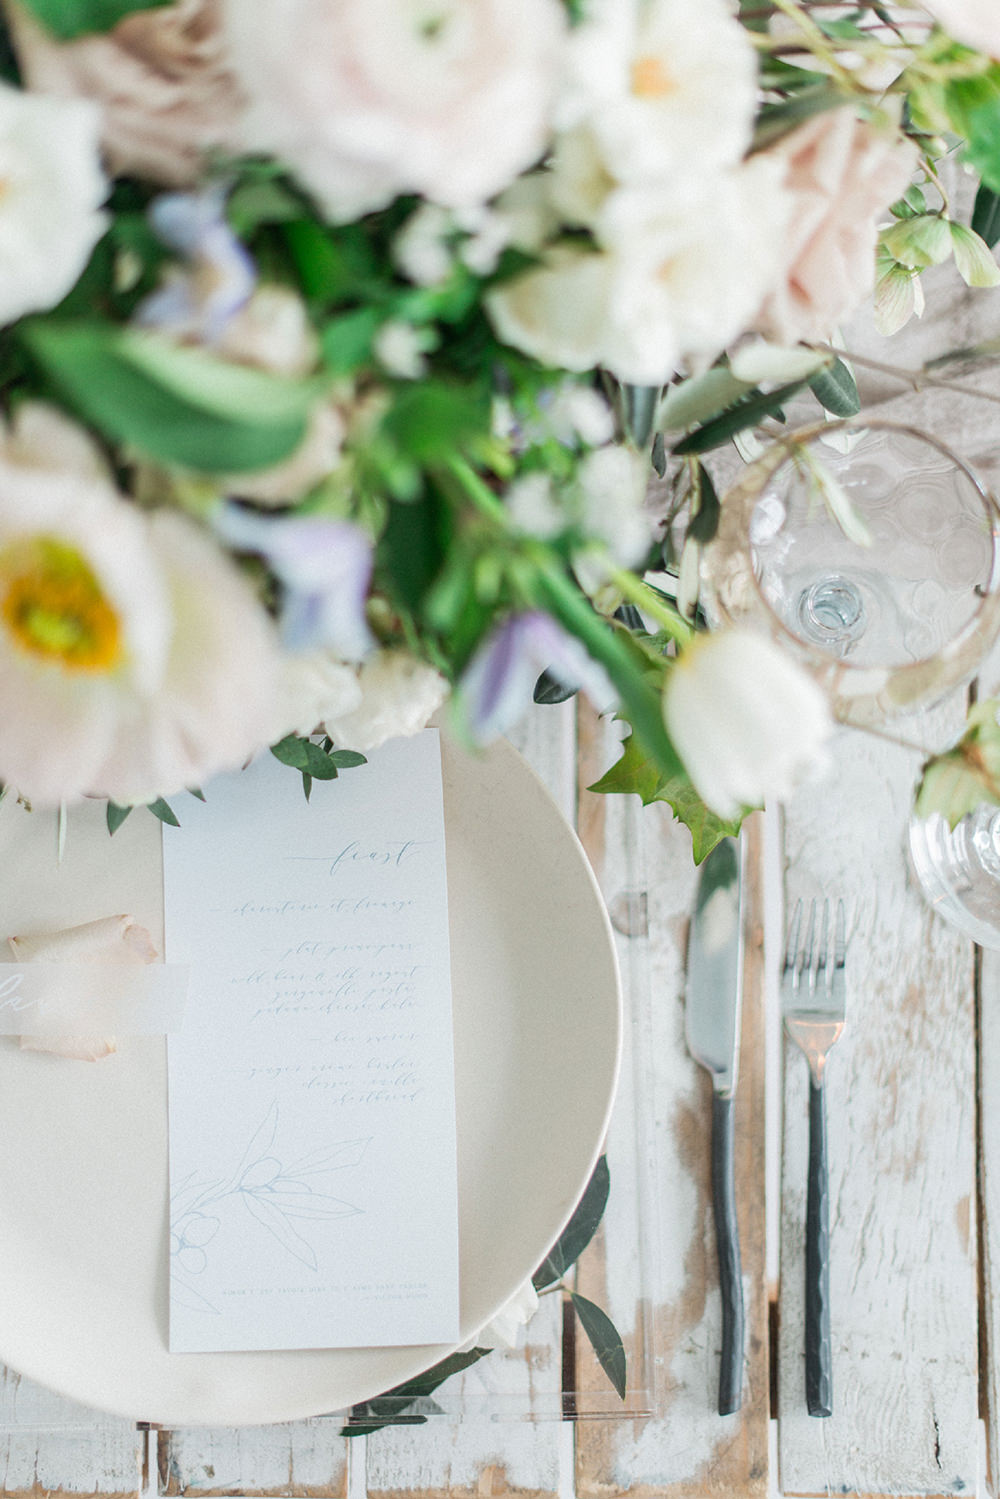 modern place settings - photo by Laura Kelly Photography http://ruffledblog.com/minimalist-monochrome-european-wedding-inspiration